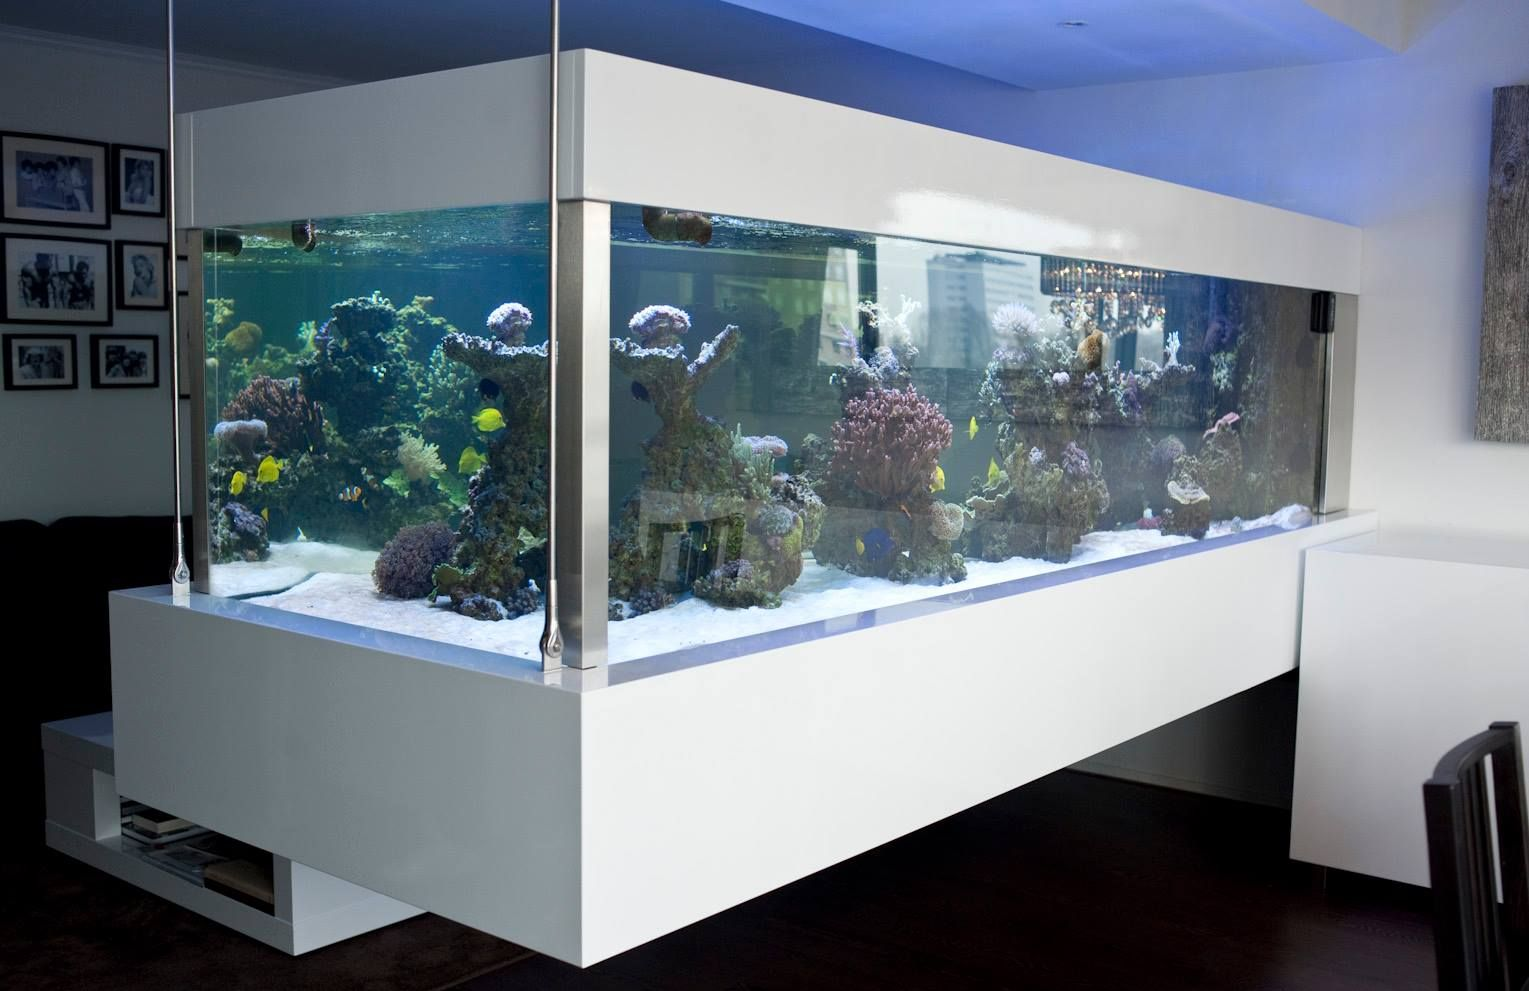 Cool Aquariums Cool Fish Tank Fish Tank Pinterest Fish Tanks And Aquariums